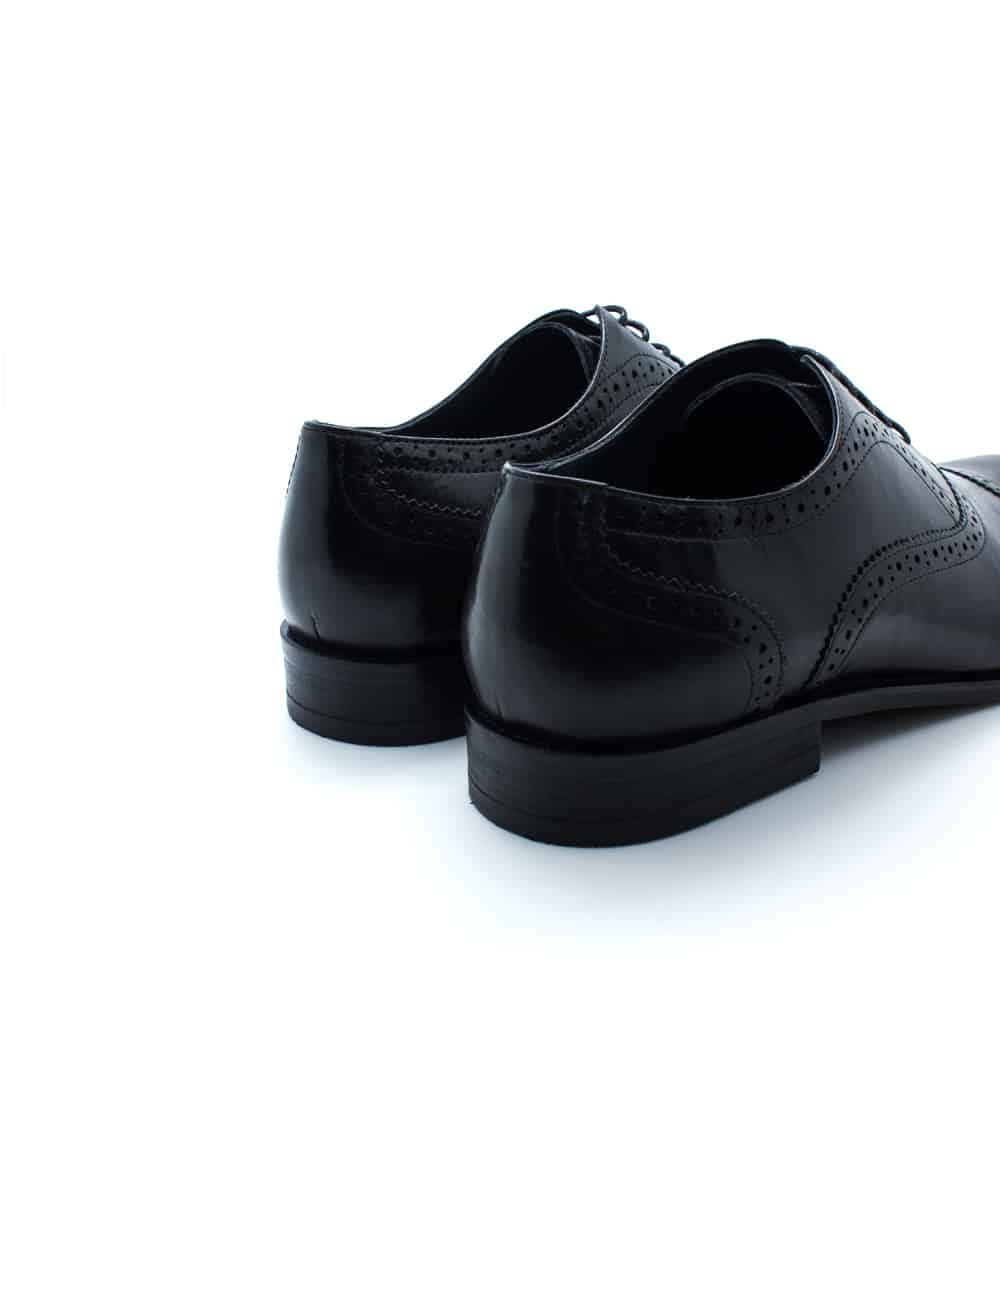 Black Leather Oxford Quarter Brogue F19A1.3